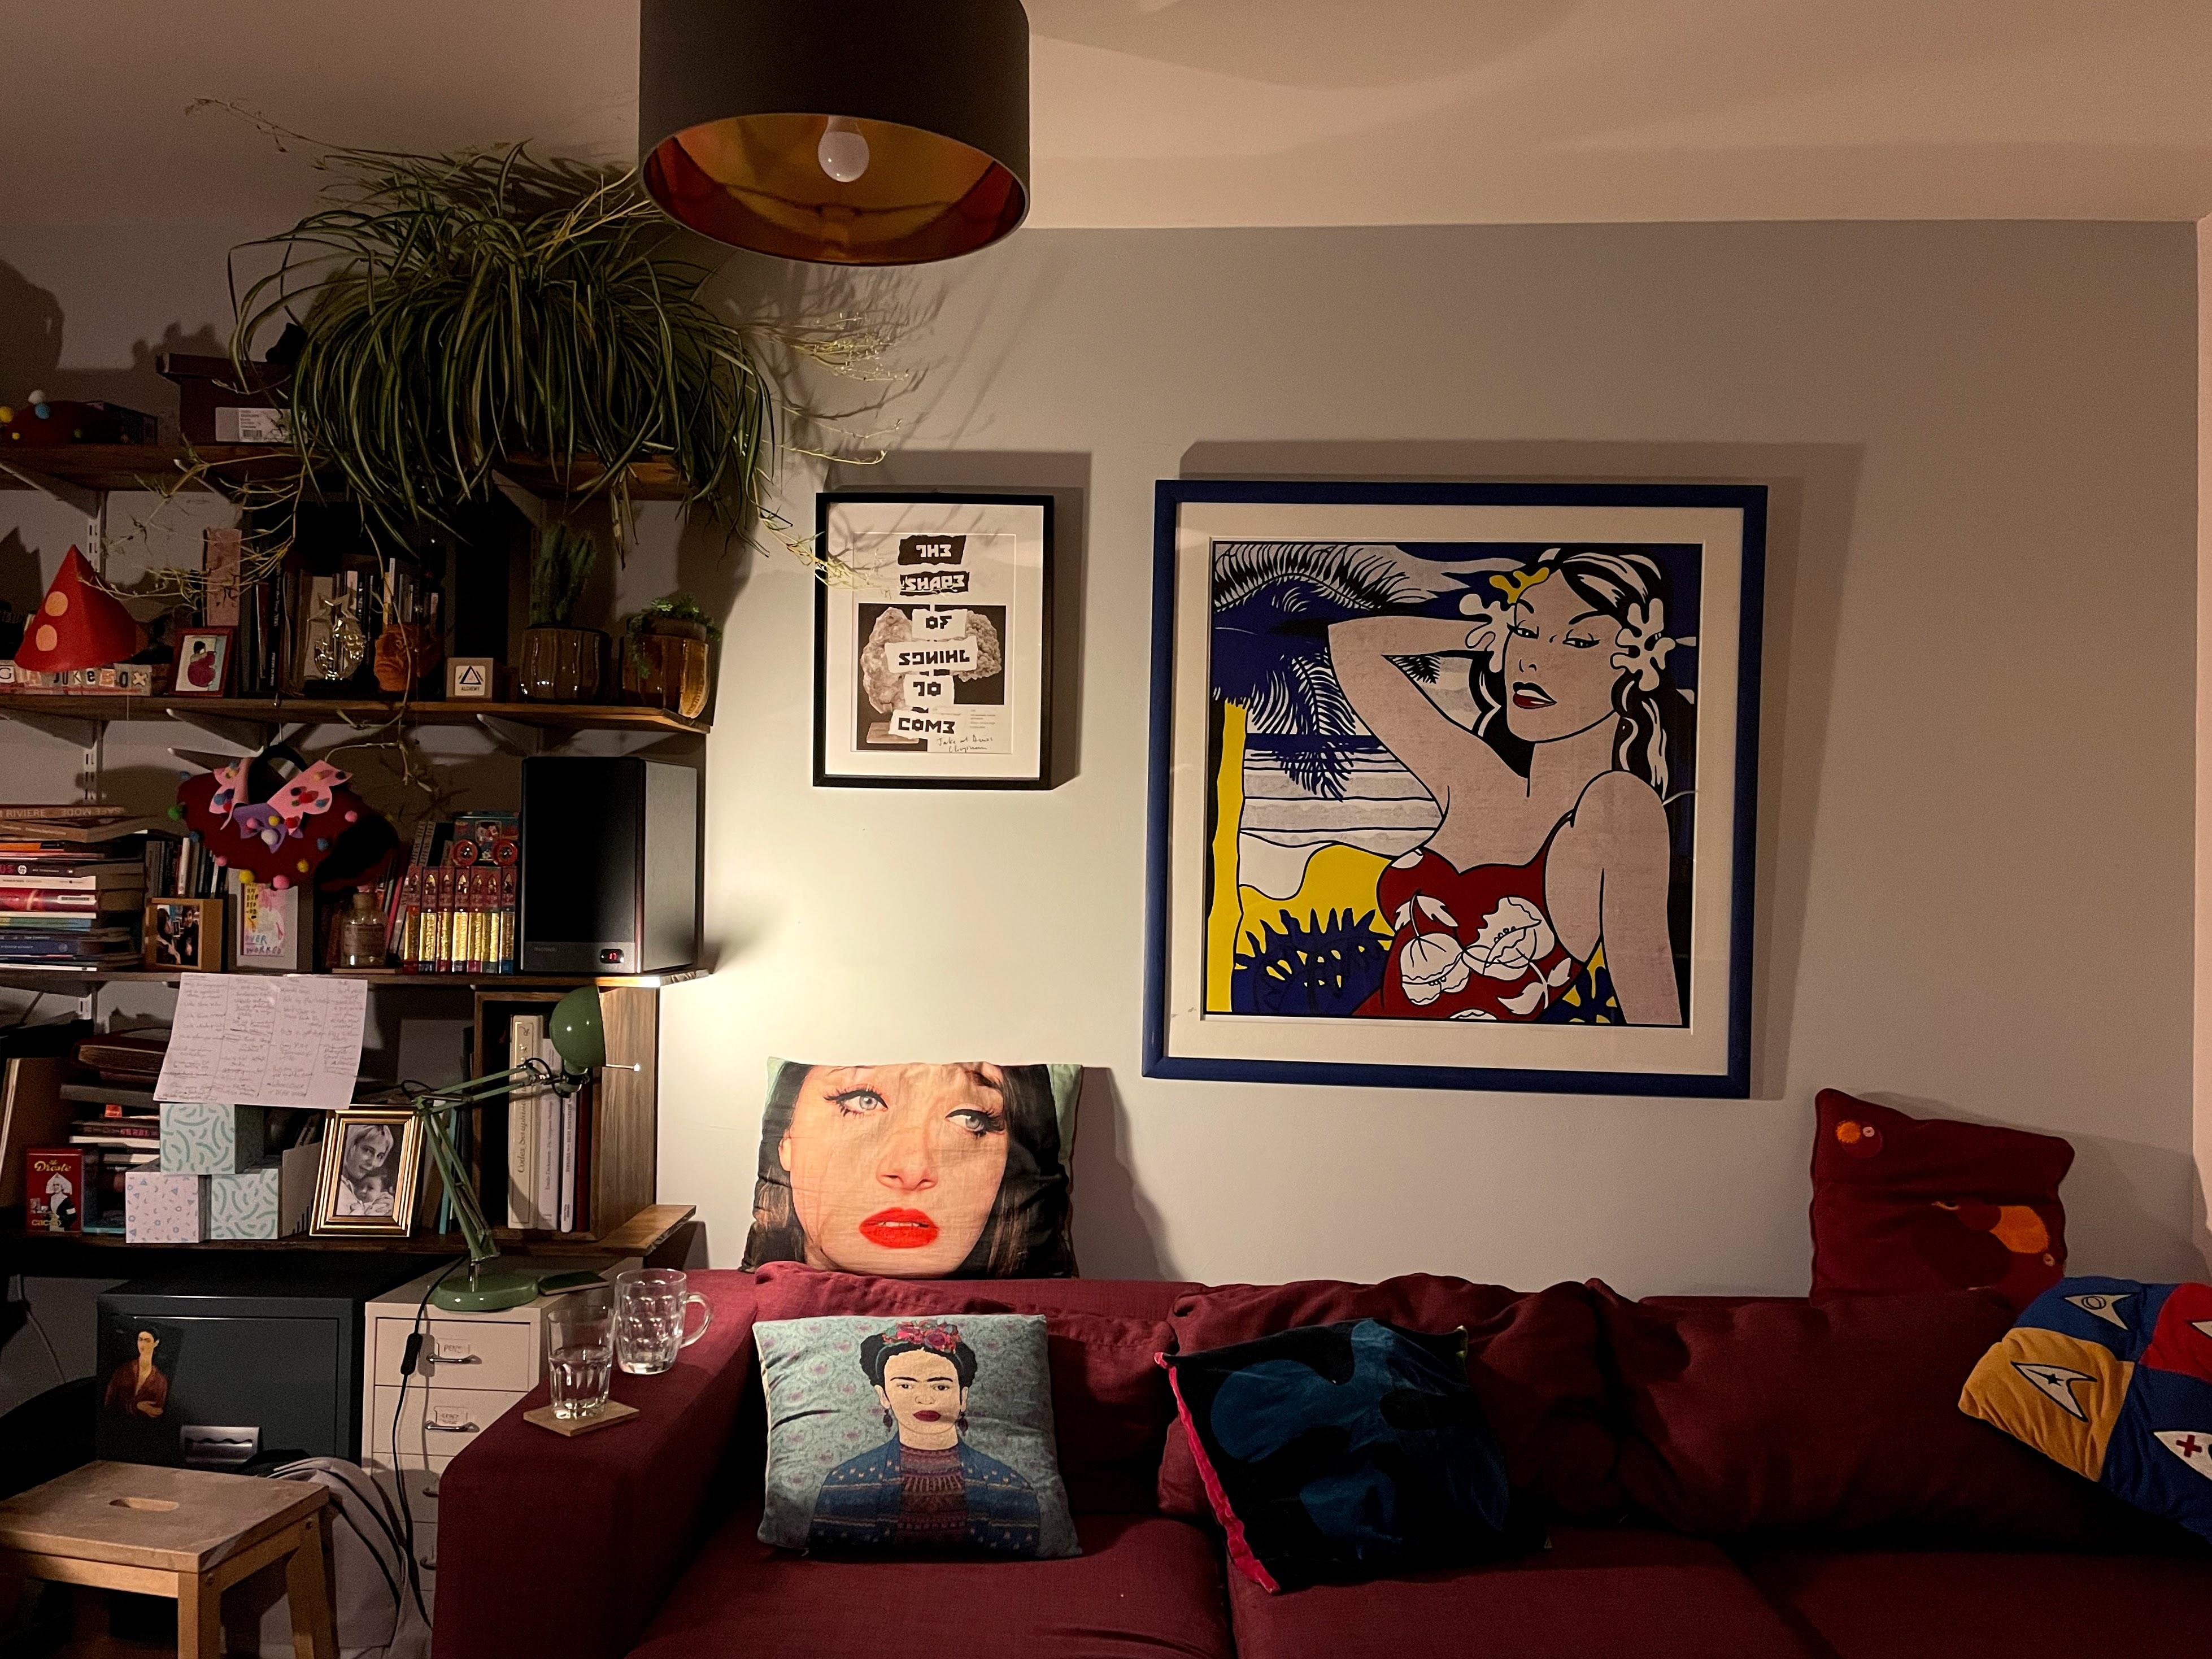 Photograph of sofa in Abi Palmer's flat